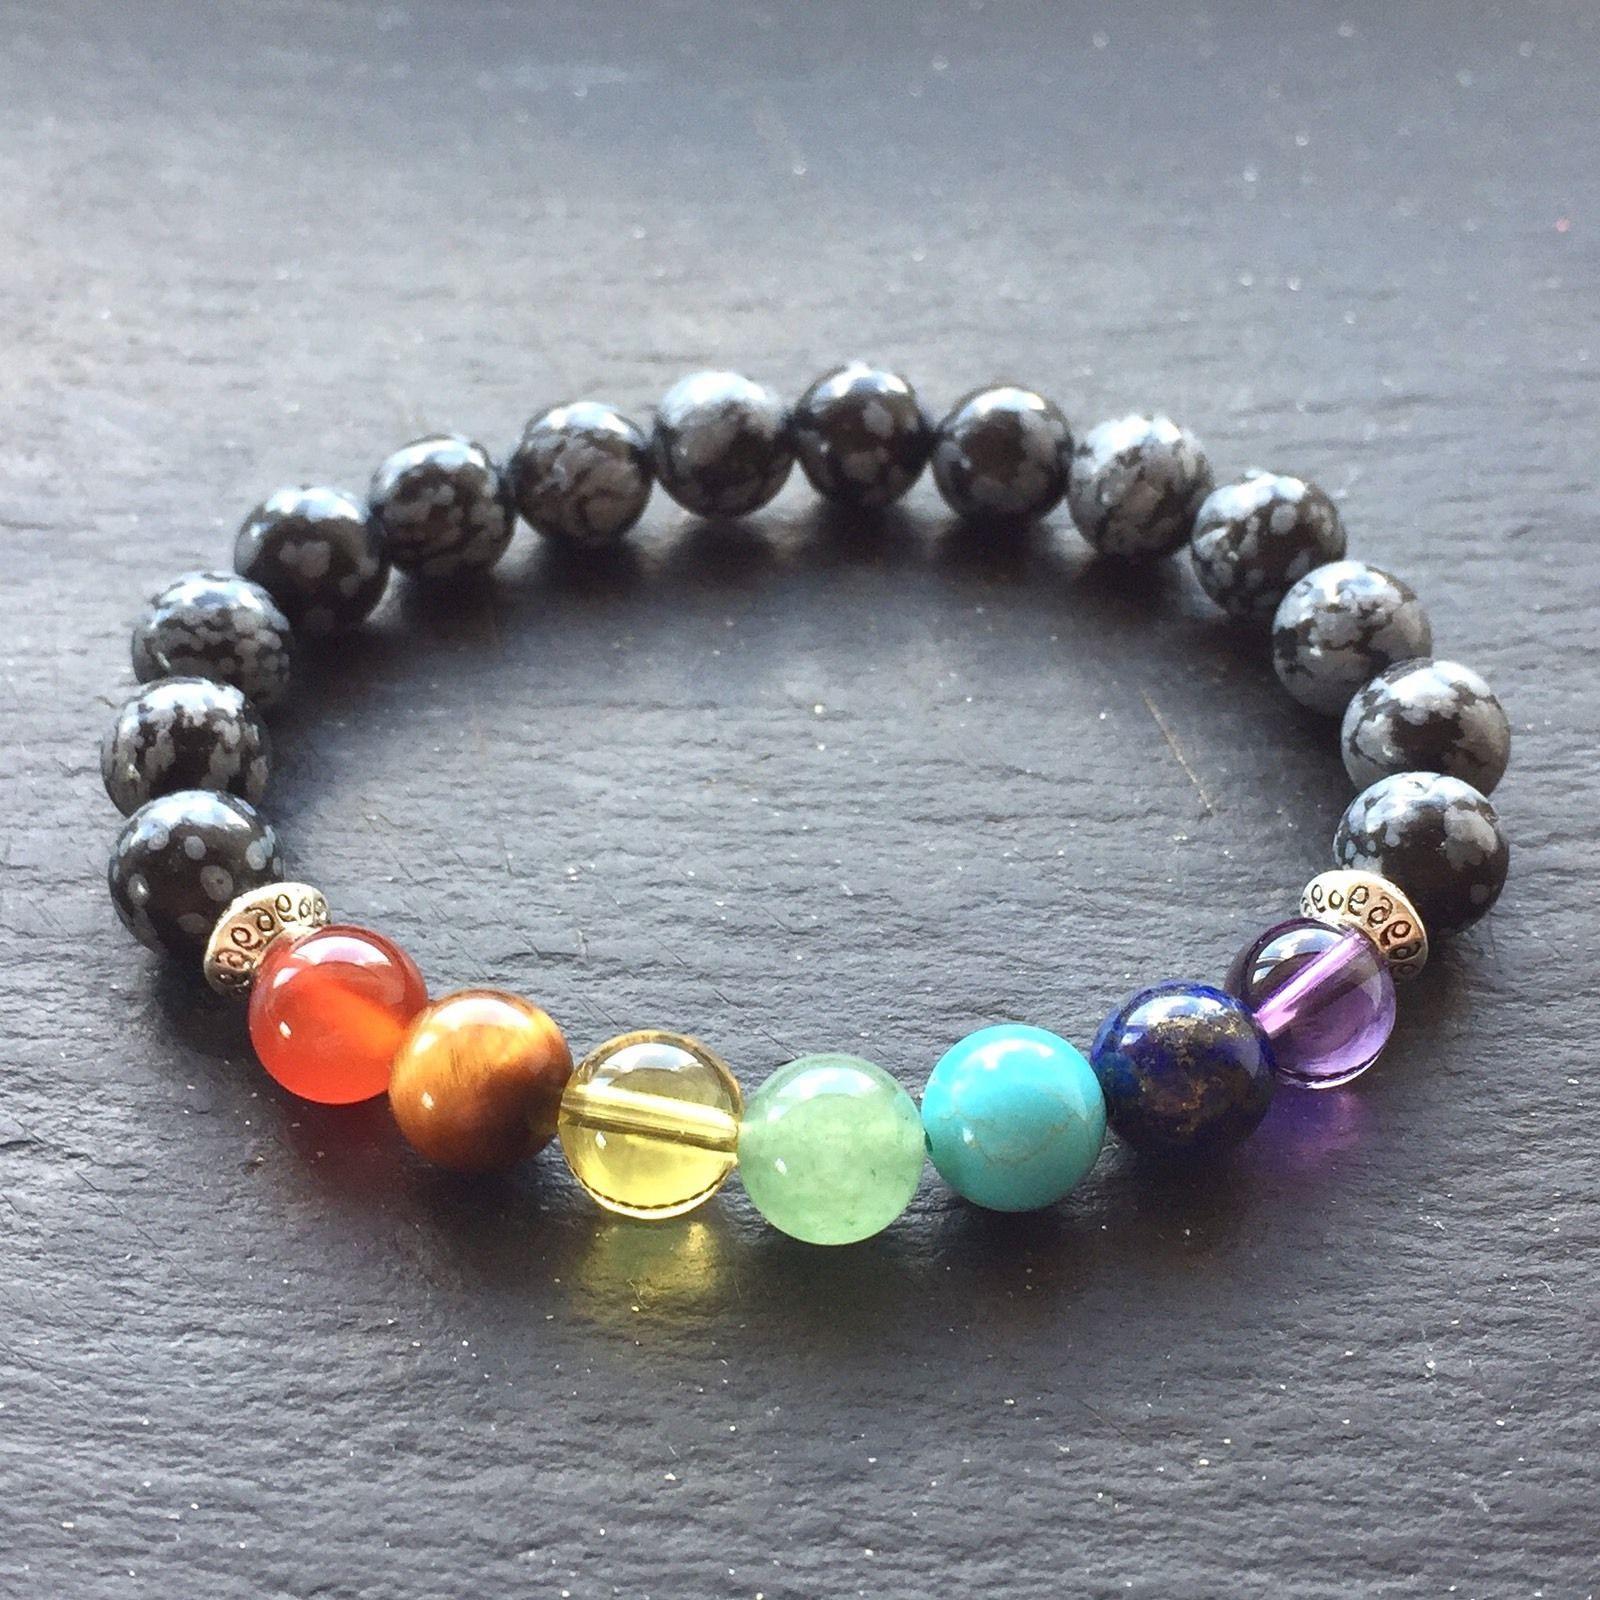 7 Chakra Bracelet With Snowflake Obsidian Beads Natural Beautiful Gemstones Uk